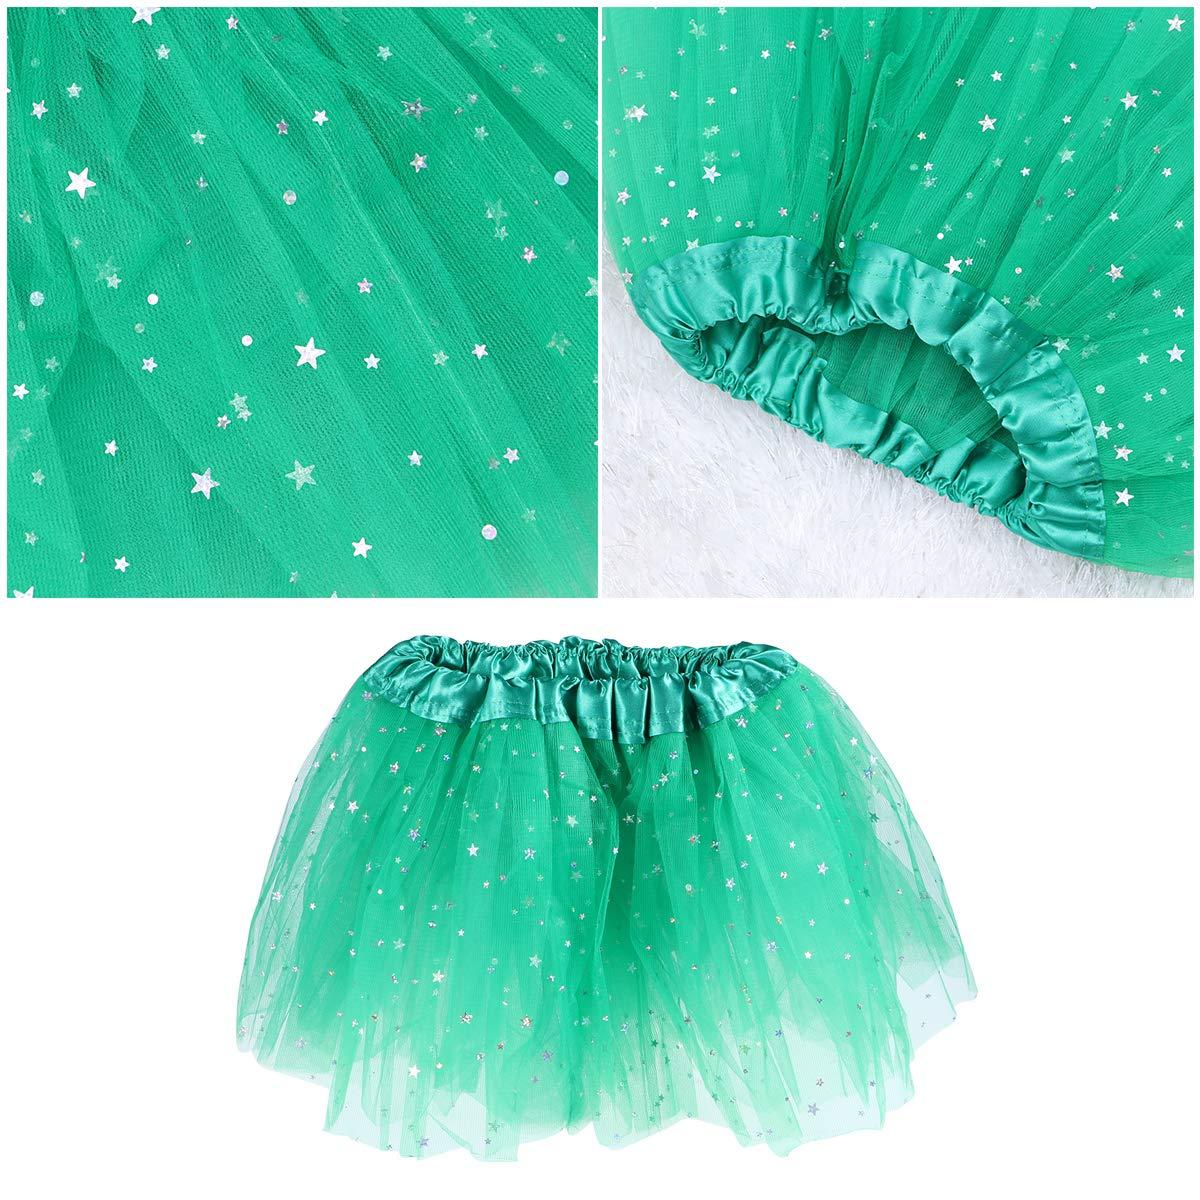 BESTOYARD Tutu Skirt St Patricks Day Tutu Elastic 3-Layered Skirt for Kids Girls Free Size Green